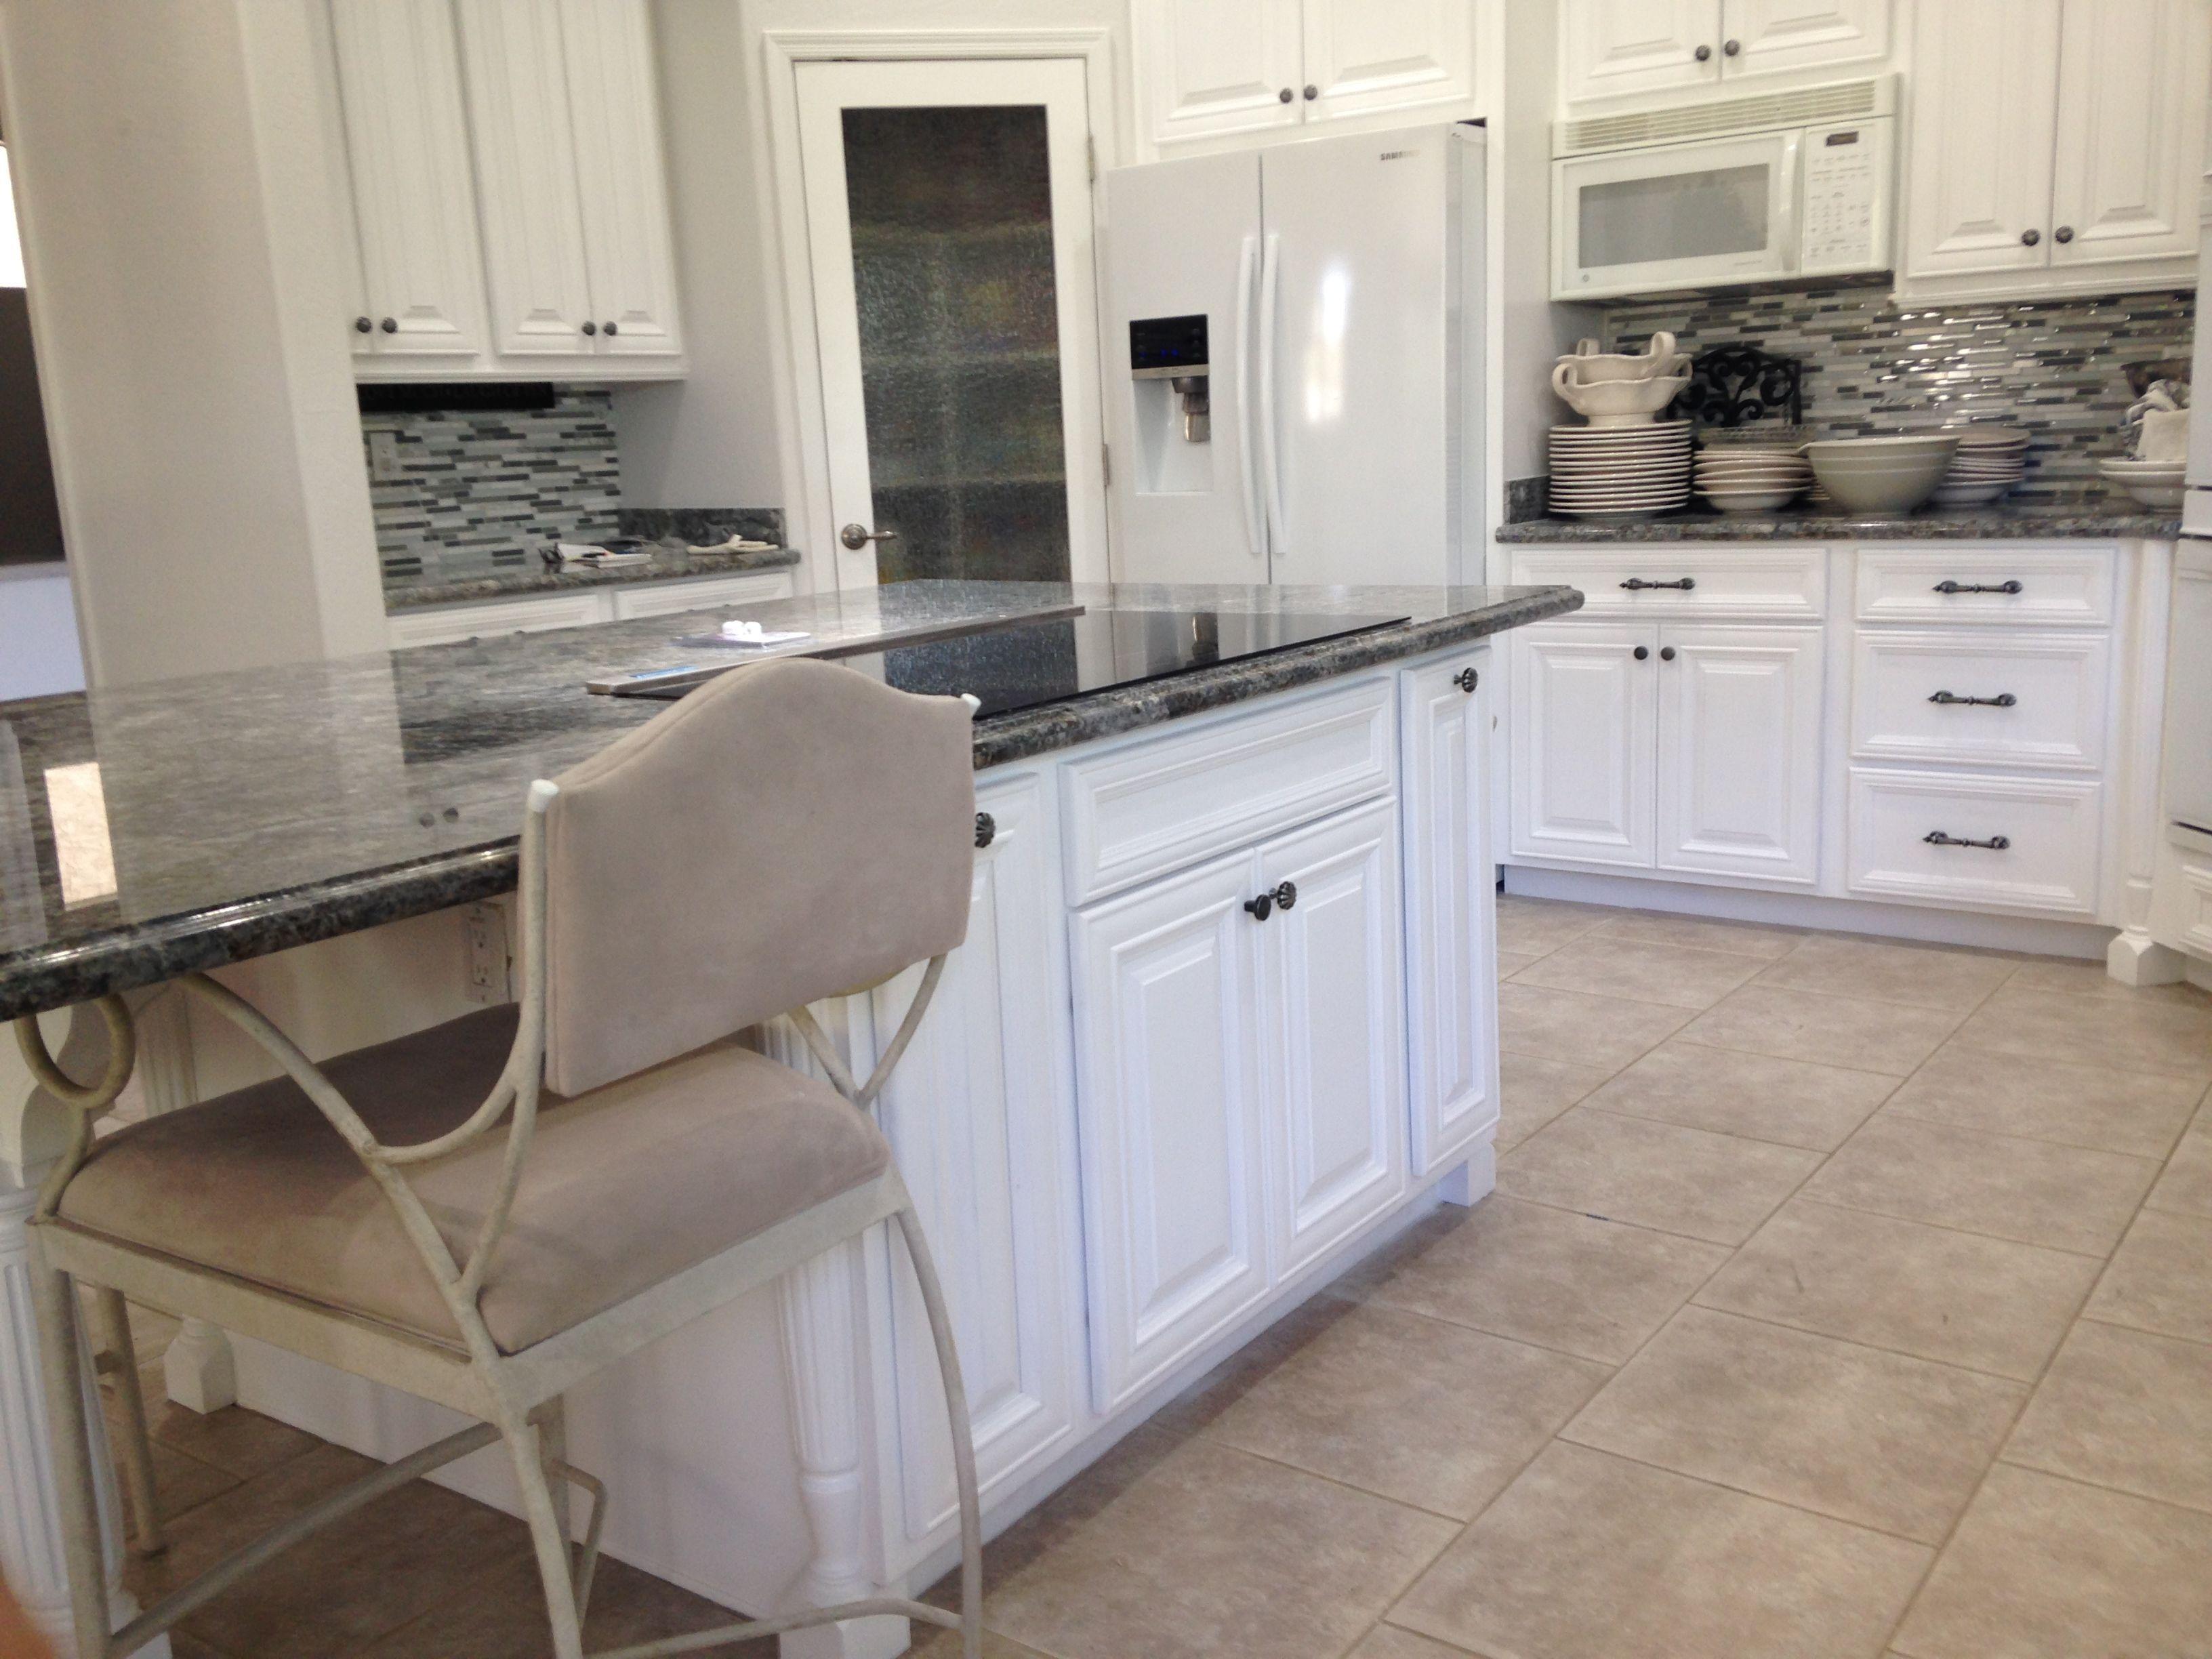 Black And White Kitchen In 2020 Kitchen Cabinets Refinish Kitchen Cabinets New Cabinet